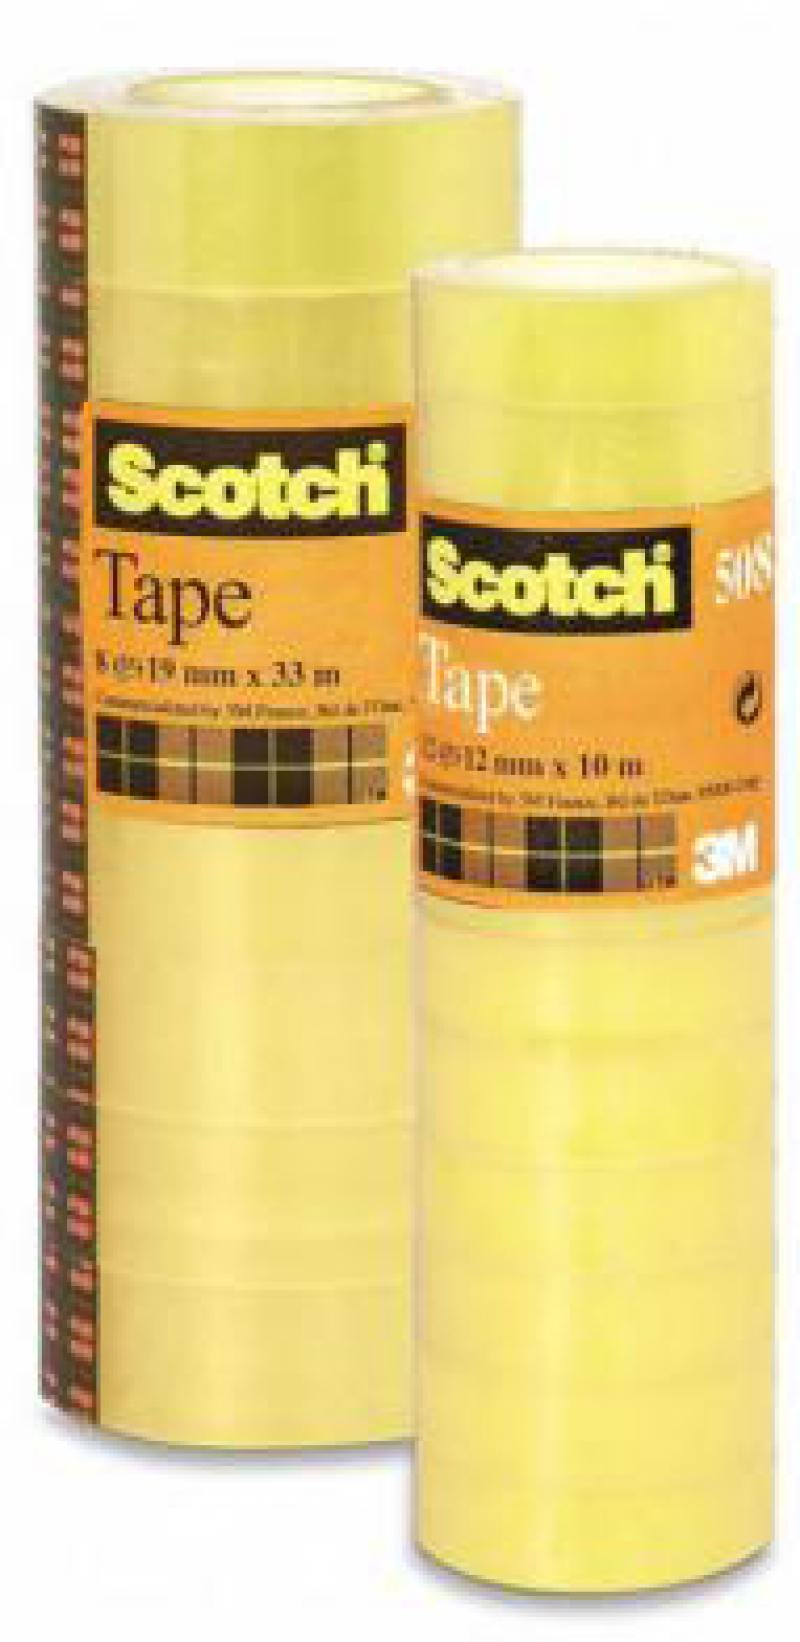 Scotch scotch scotch greatest hits